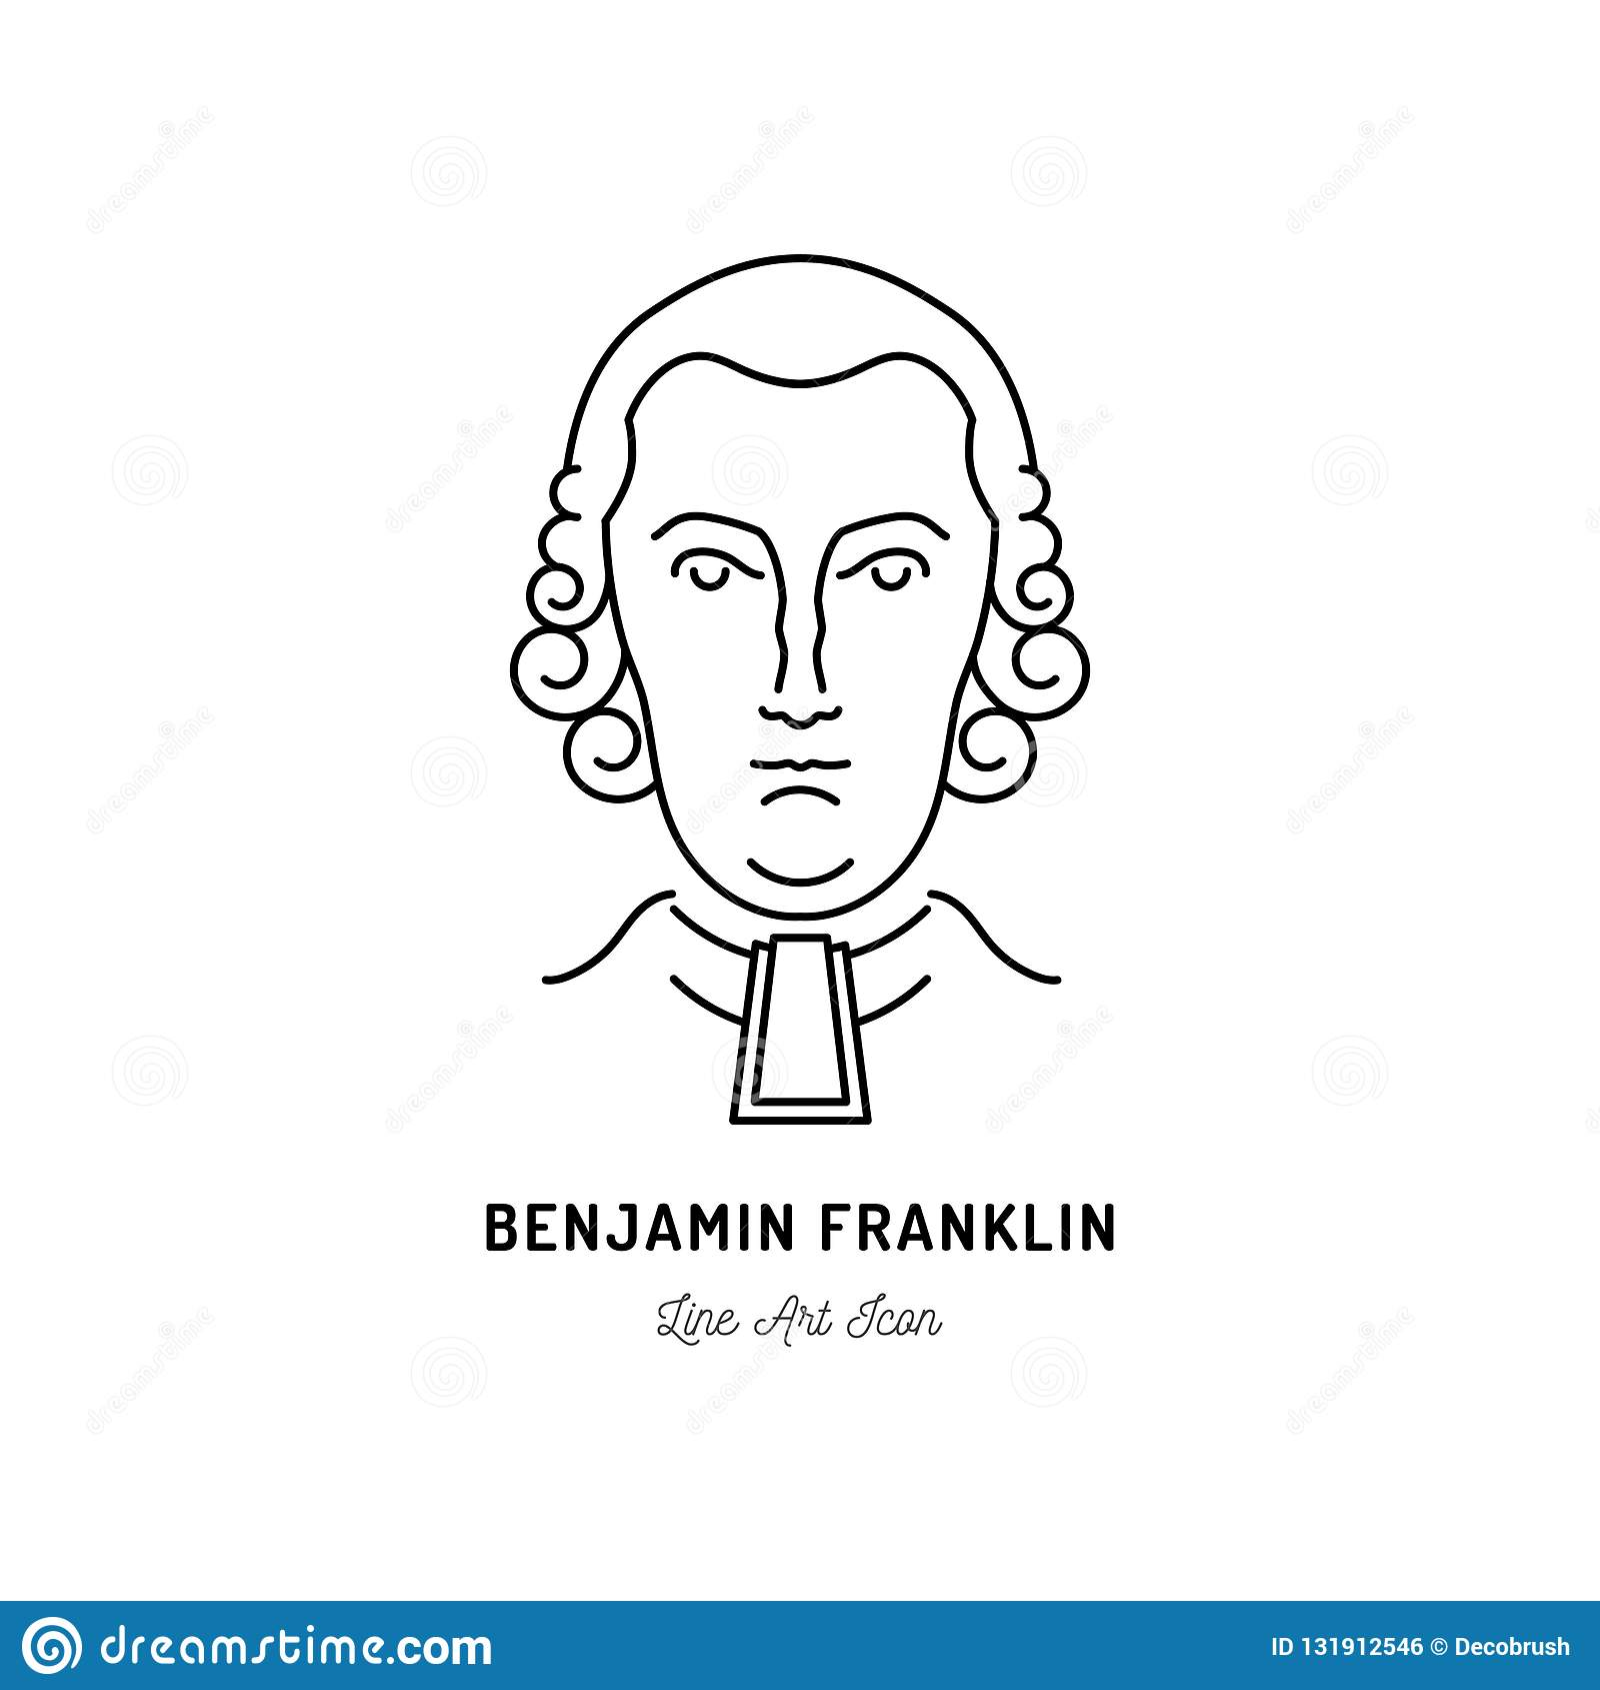 Politiker Benjamin Franklin Icons USA Linie Kunstikone, Vektorillustration